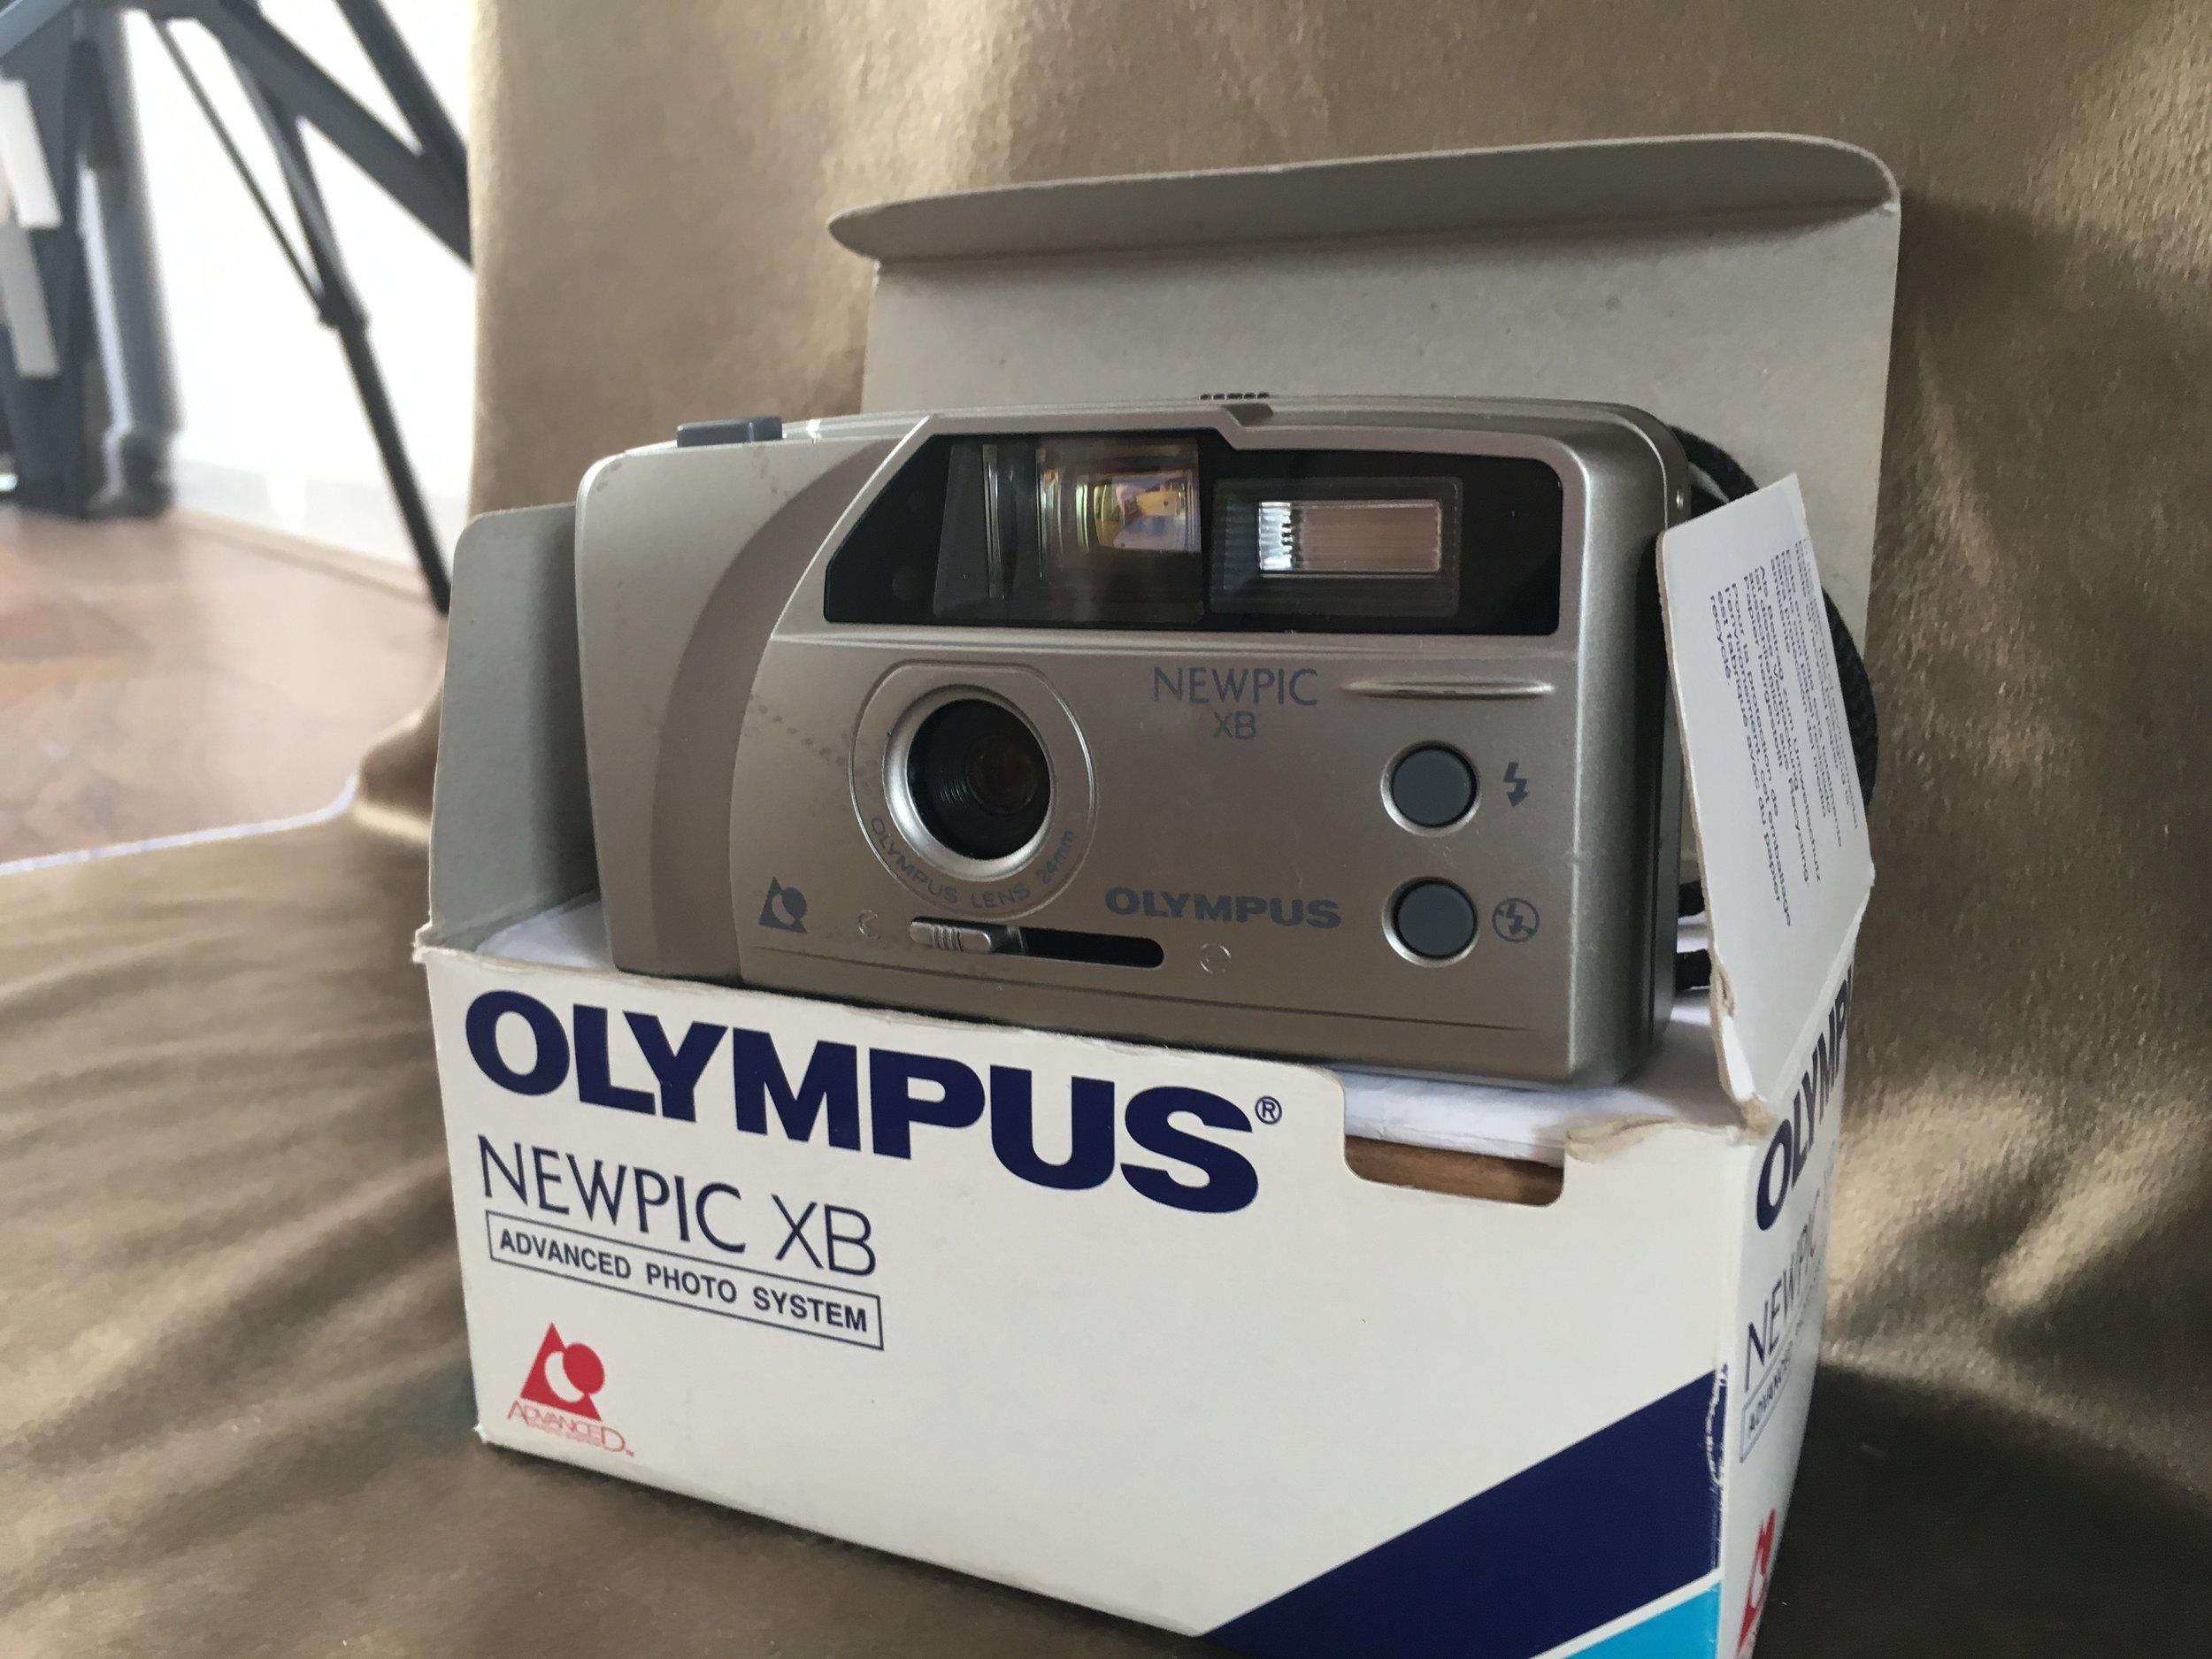 Meet my camera. - Yes. Basic is an understatement!